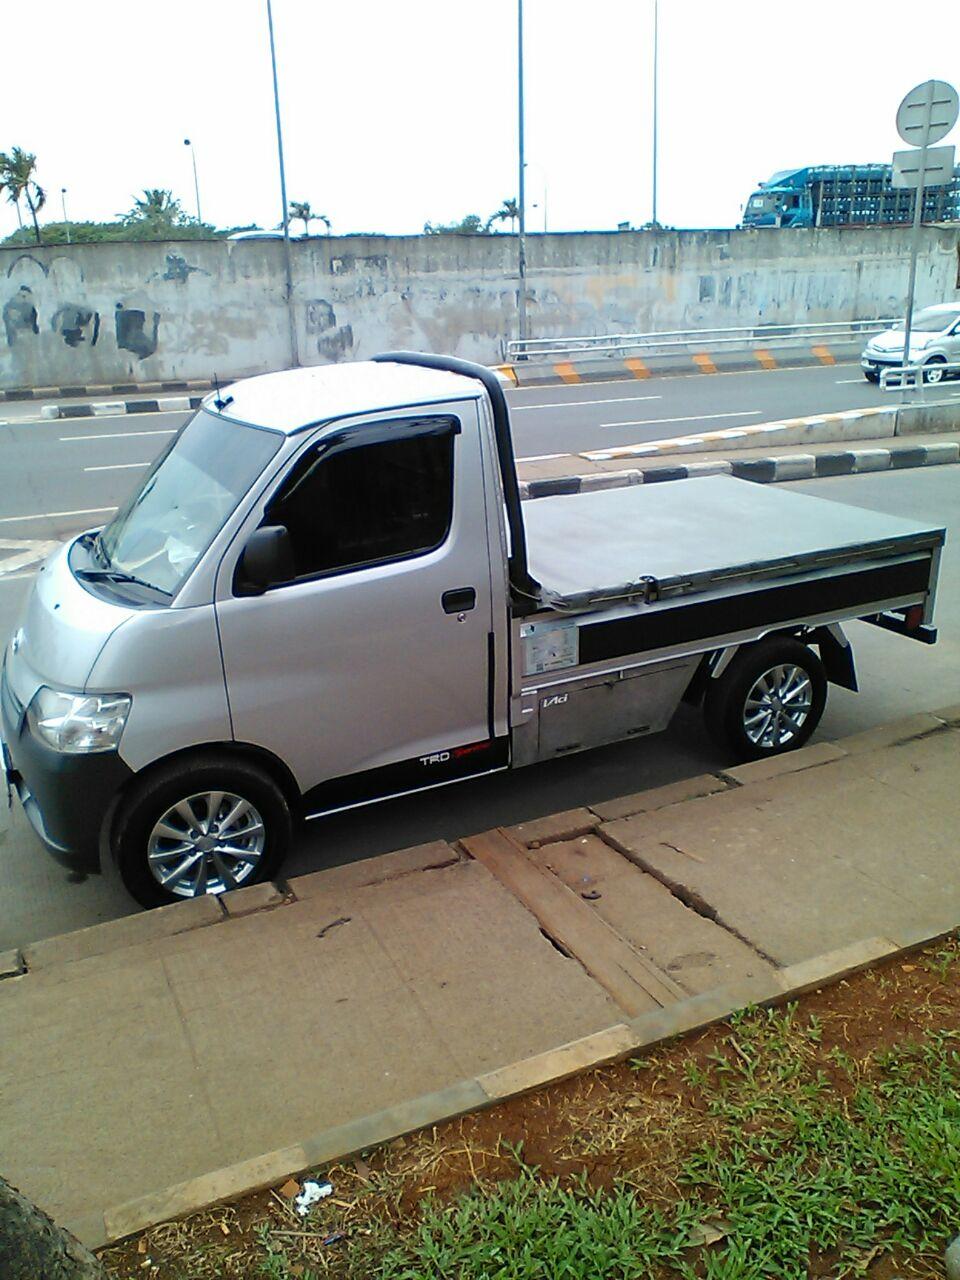 Pickup Gran Max 2014 | Didi Pickup - Sewa menyewa jadi lebih mudah di Spotsewa